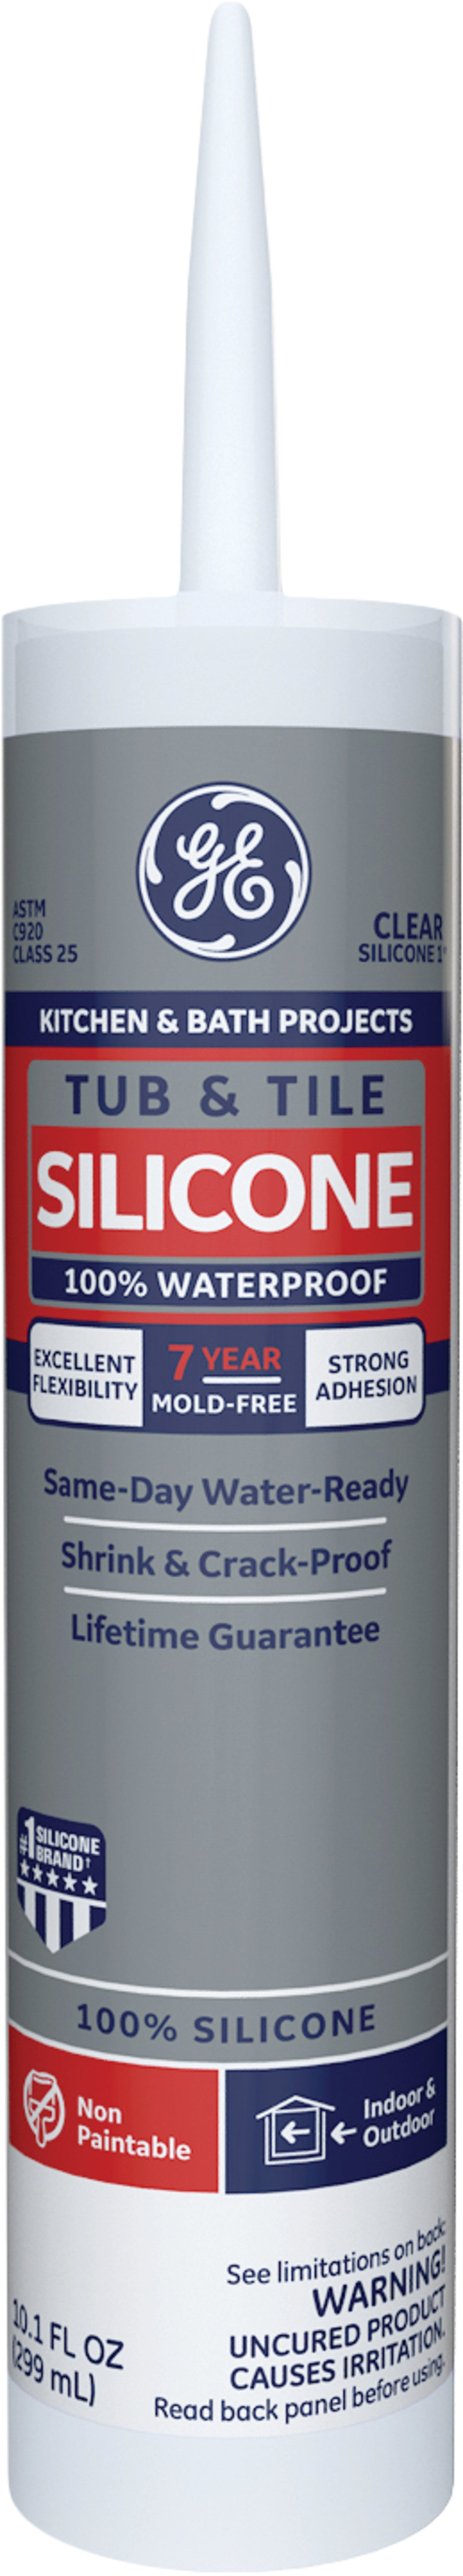 buy ge silicone 1 tub tile kitchen